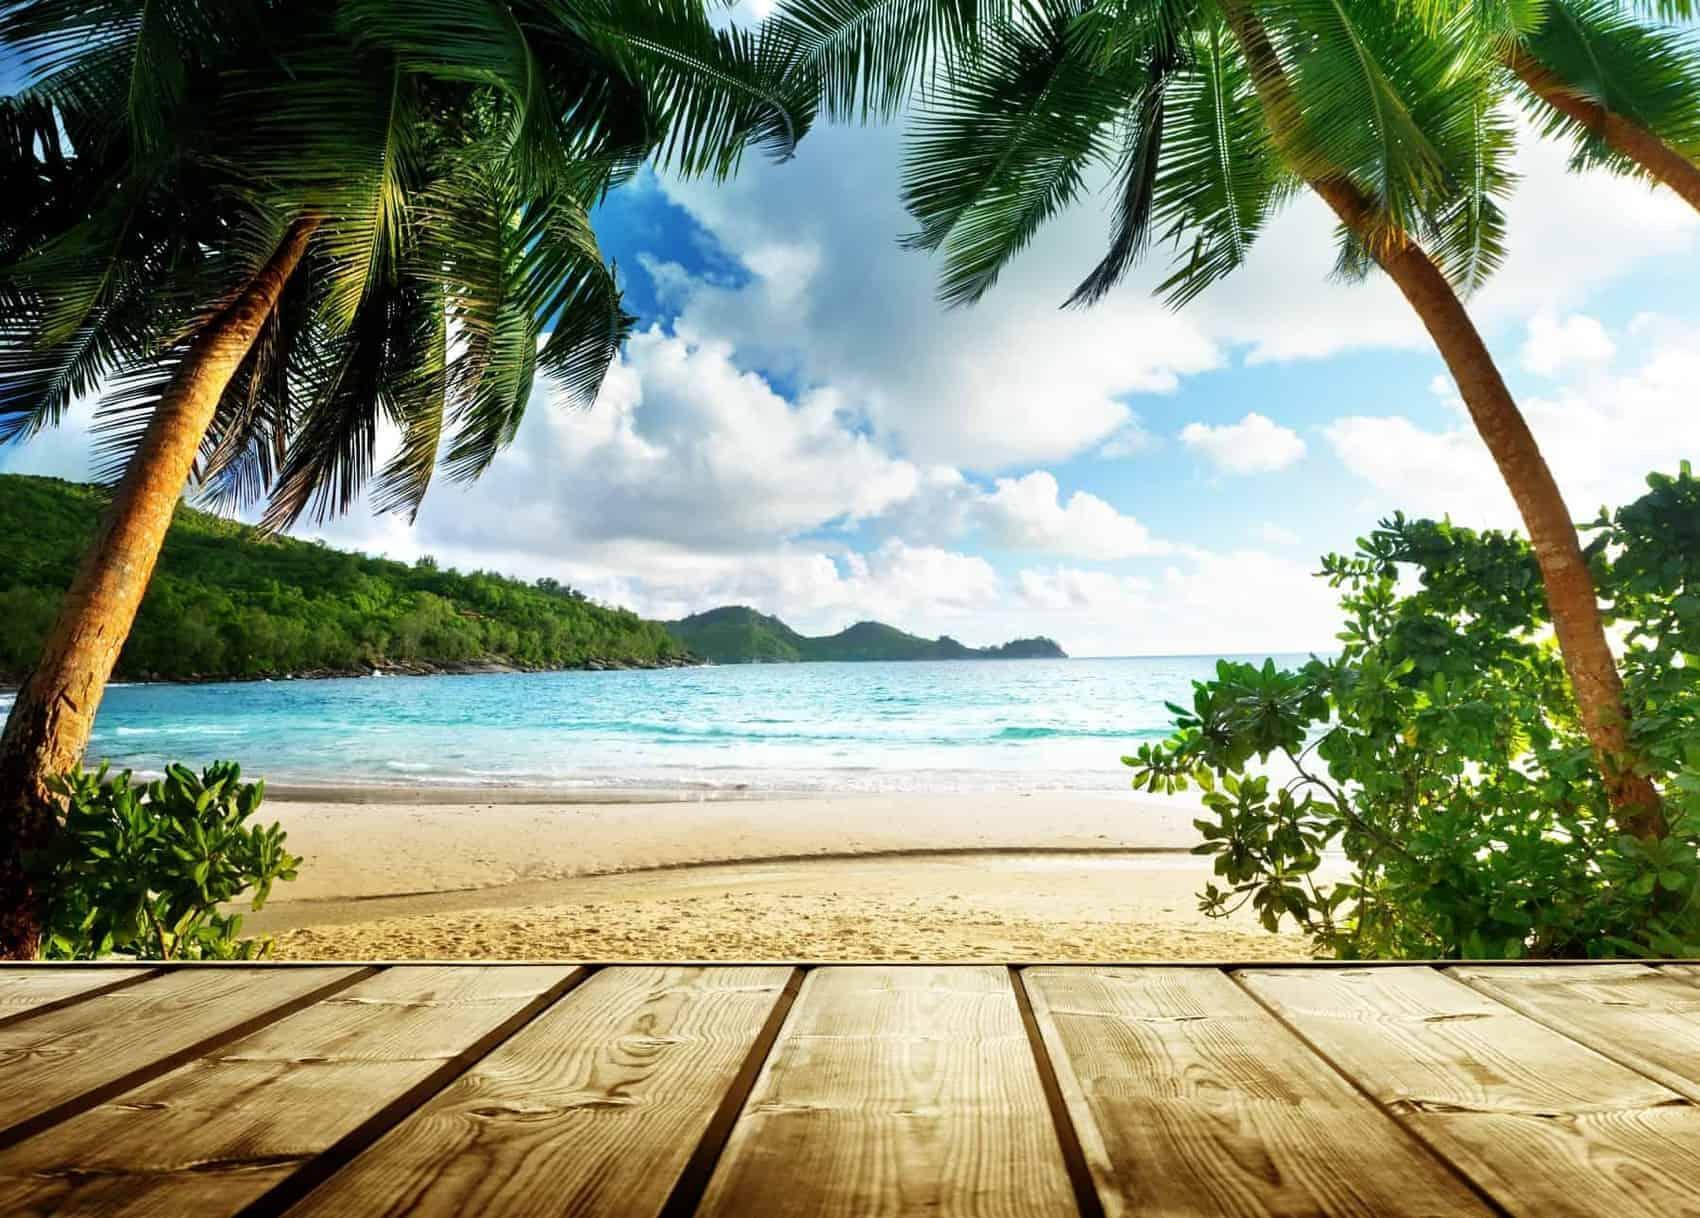 Seychelles-wooden-pier